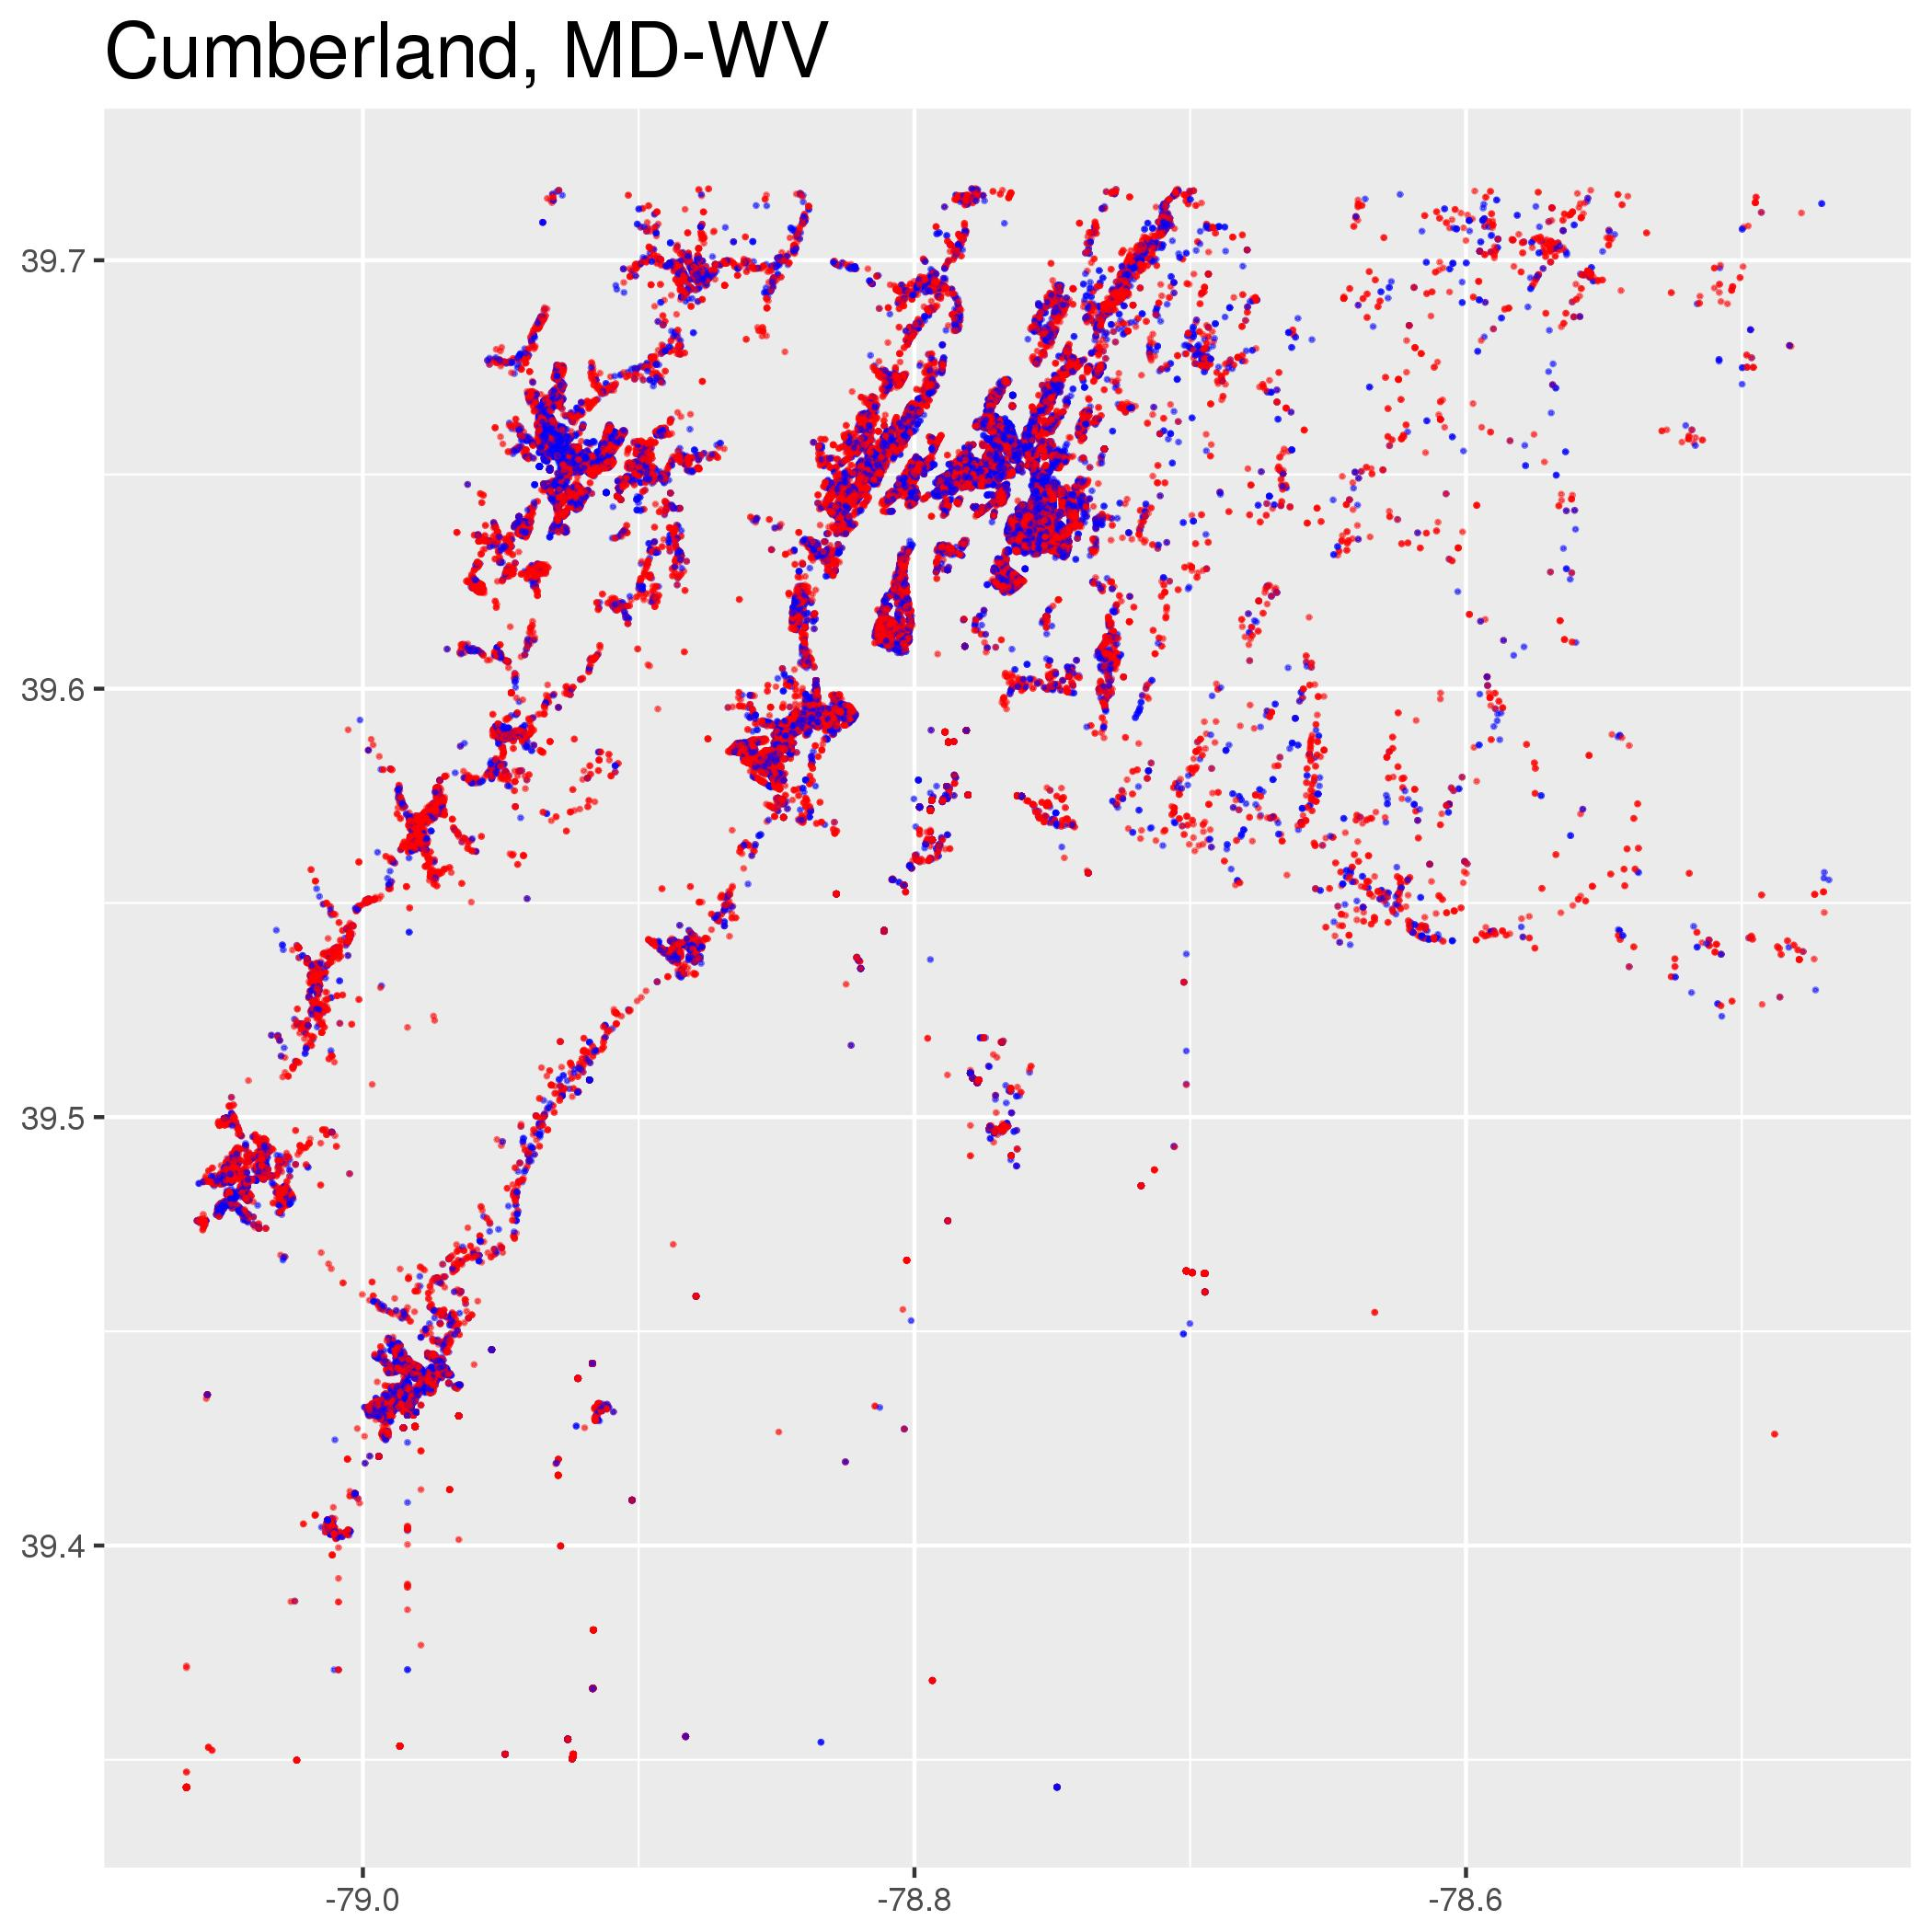 CumberlandMD-WV.jpeg